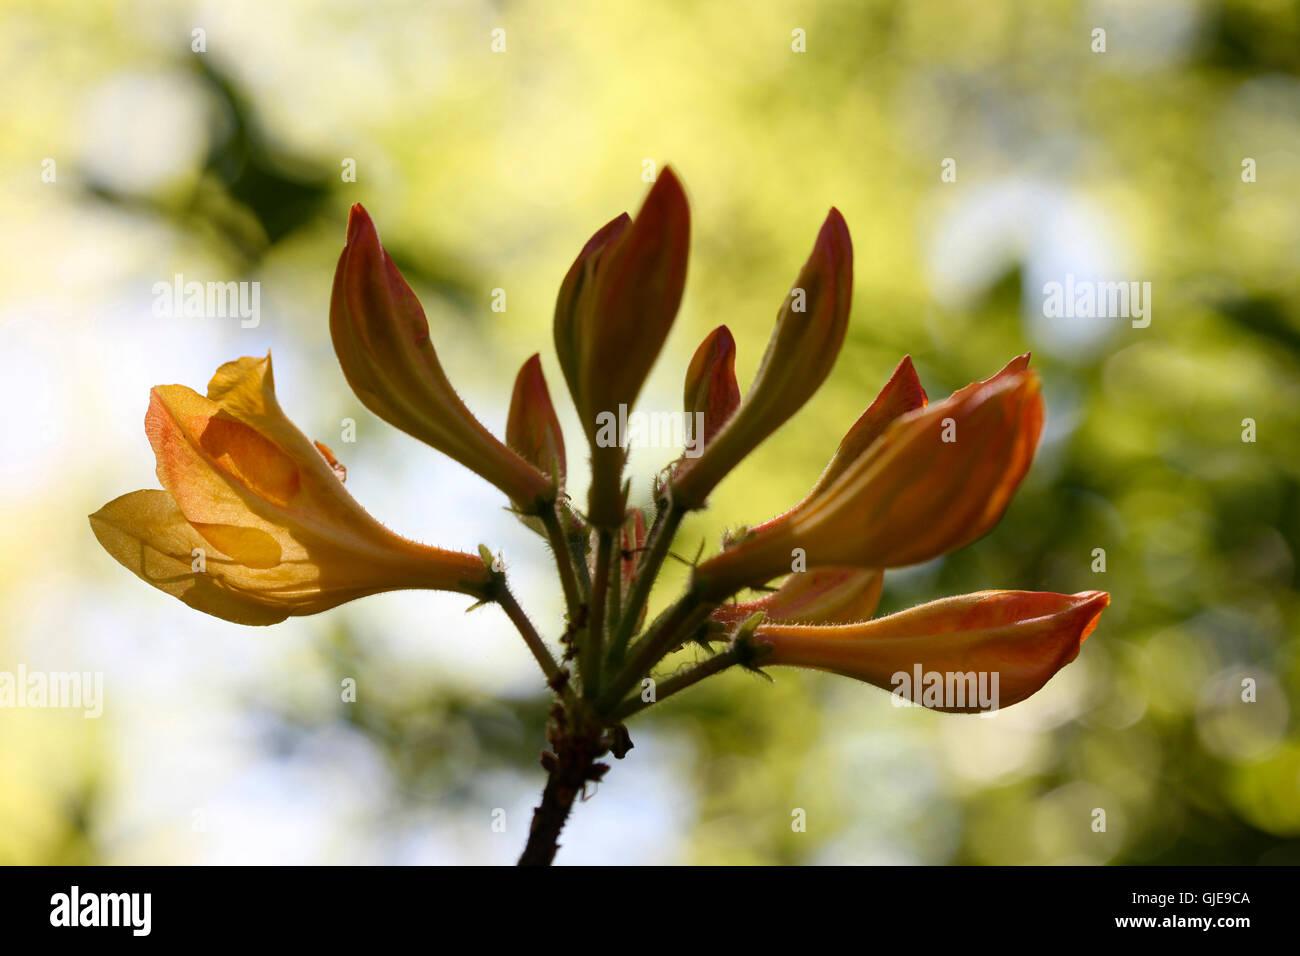 beautiful yellow azalea buds emerging - new life Jane Ann Butler Photography JABP1573 - Stock Image